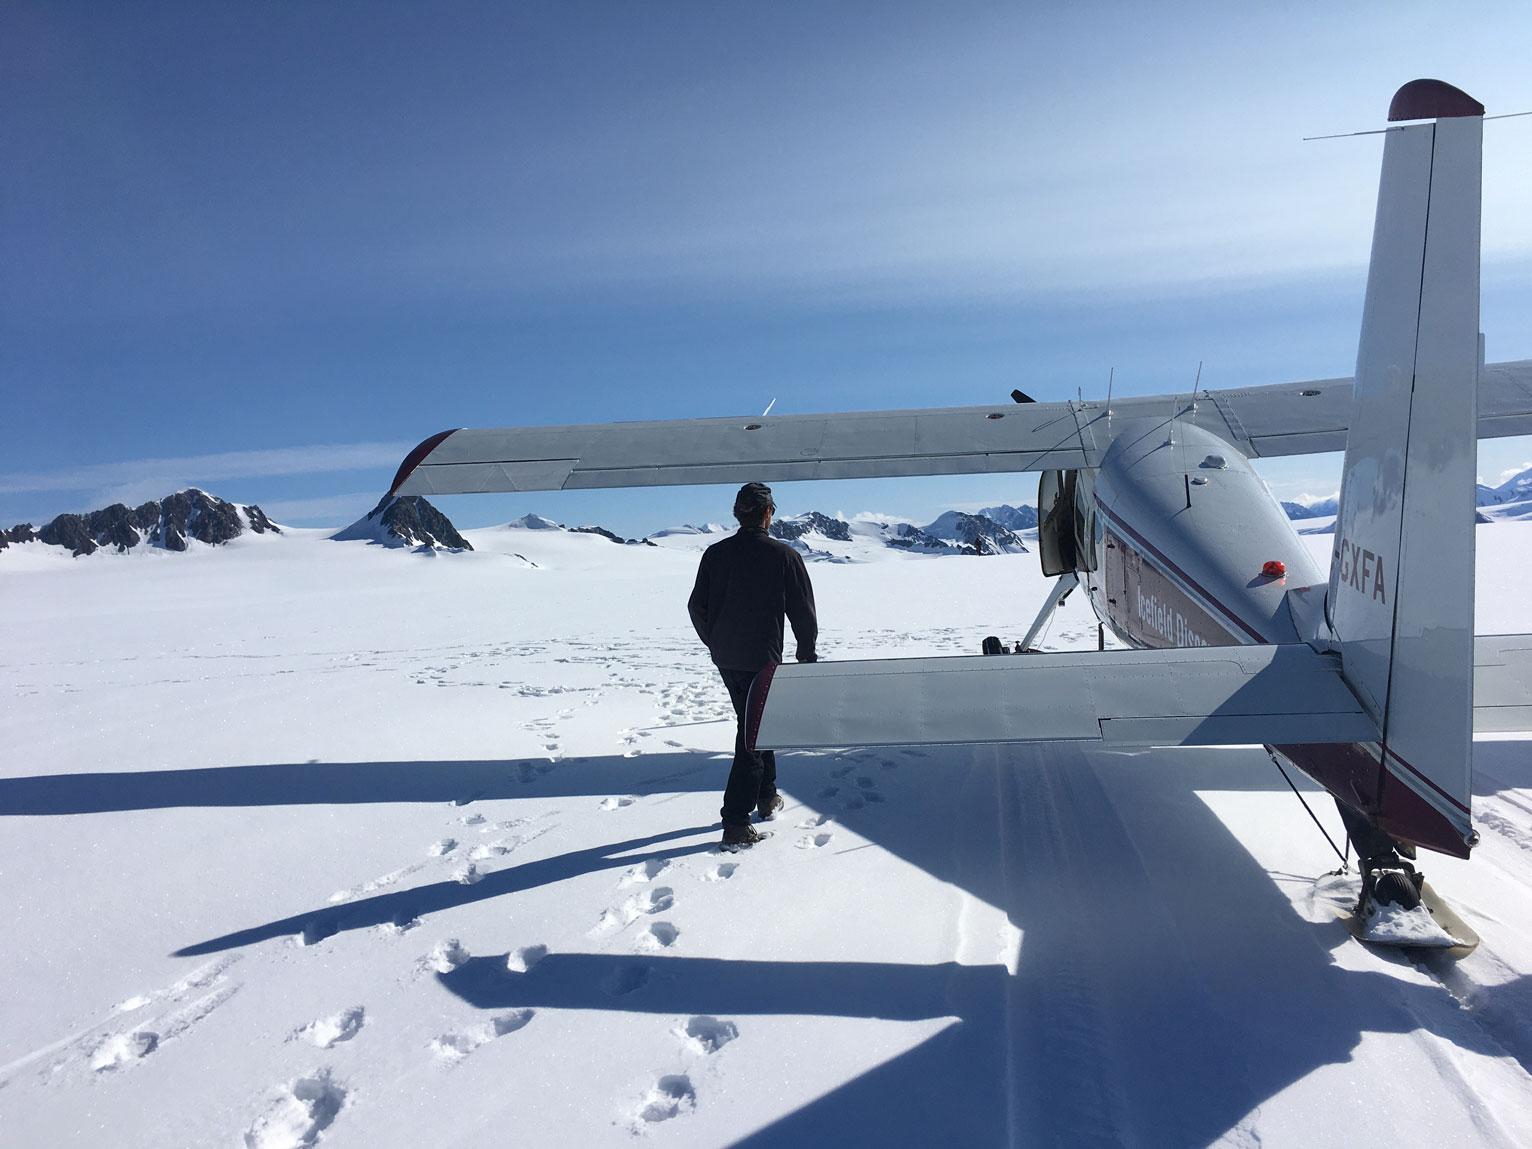 C:\Users\Russ\Desktop\2020Aug, Yukon\Glacier flight\IMG_2234.JPG